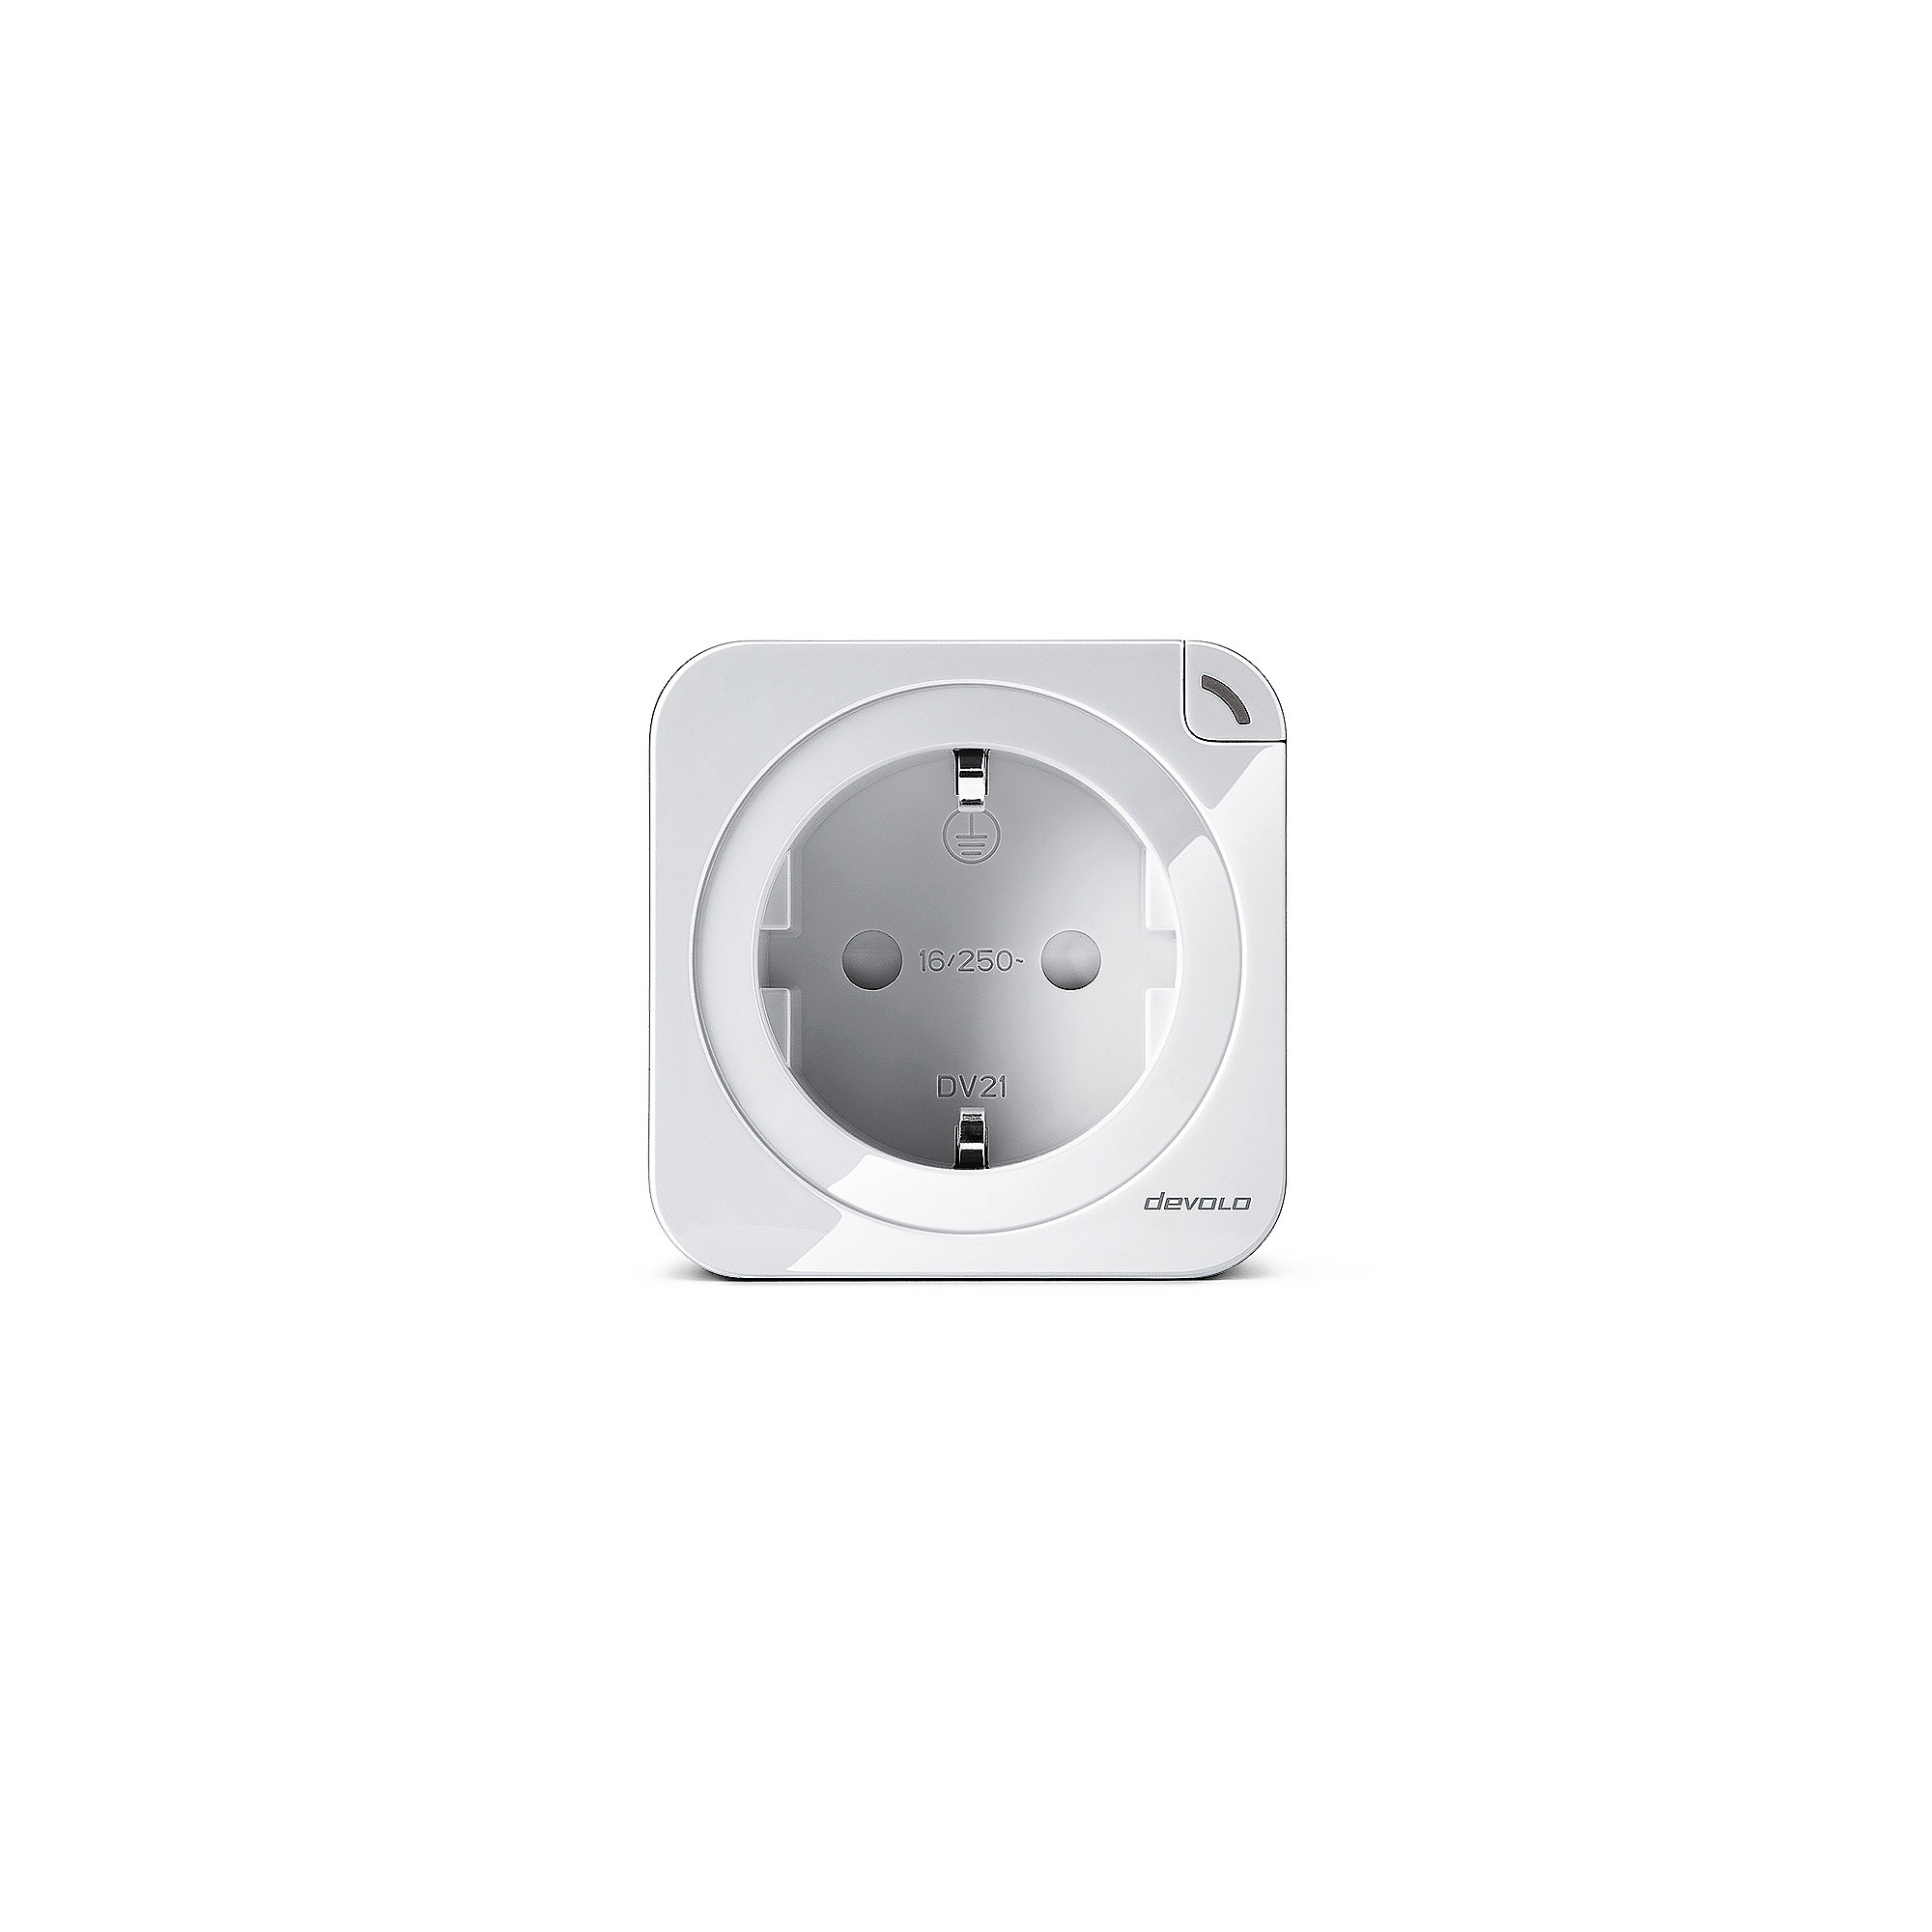 devolo Home Control 5er Set Schalt- & Messsteckdose 2.0 (Smart Home ...